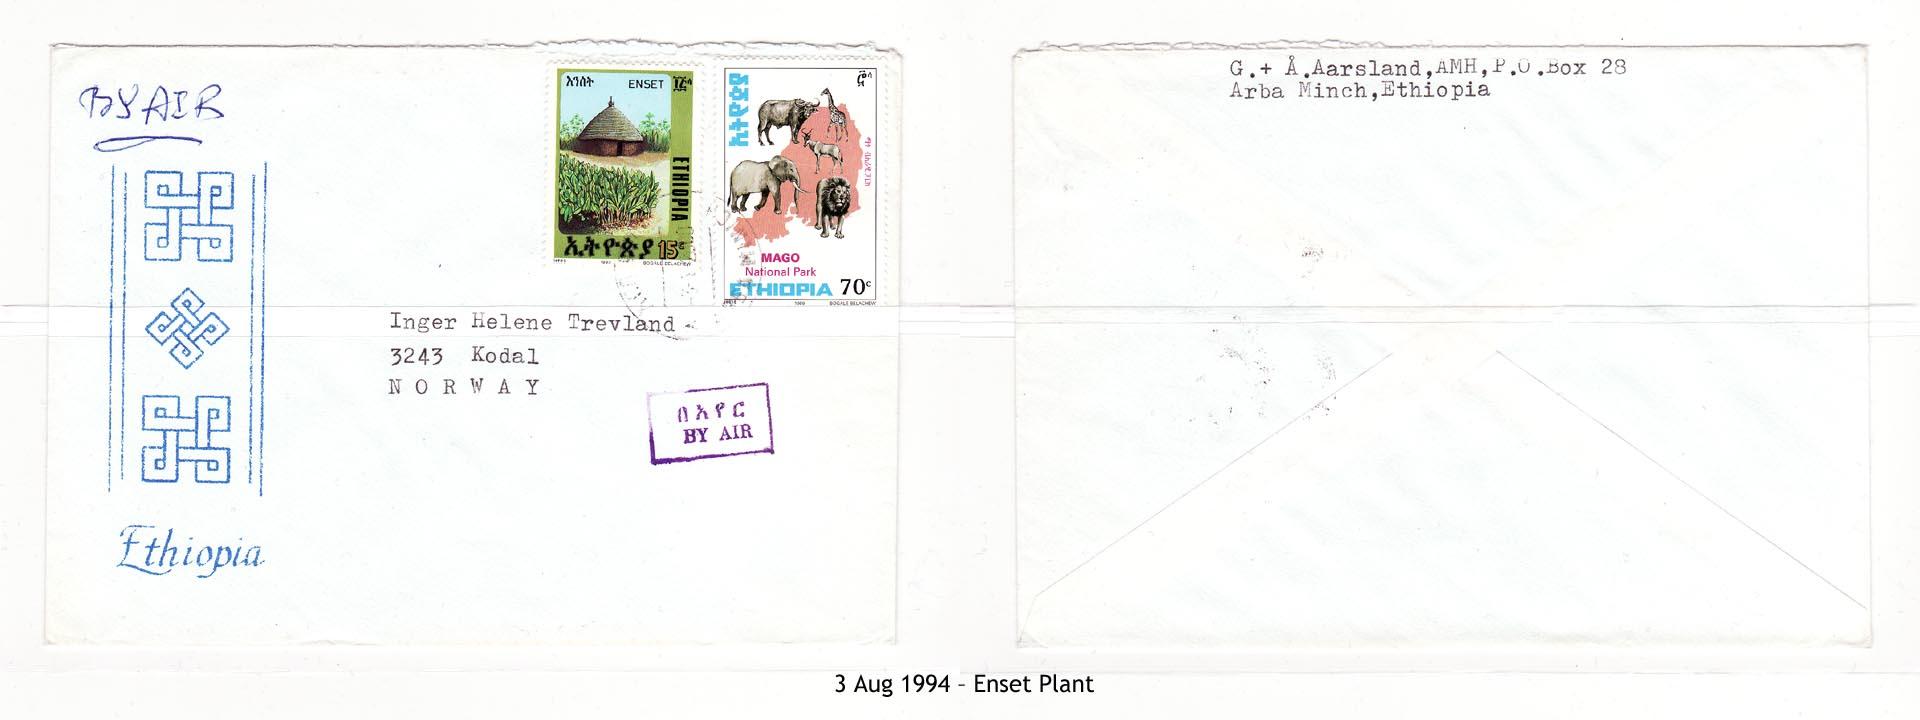 19940803 – Enset Plant